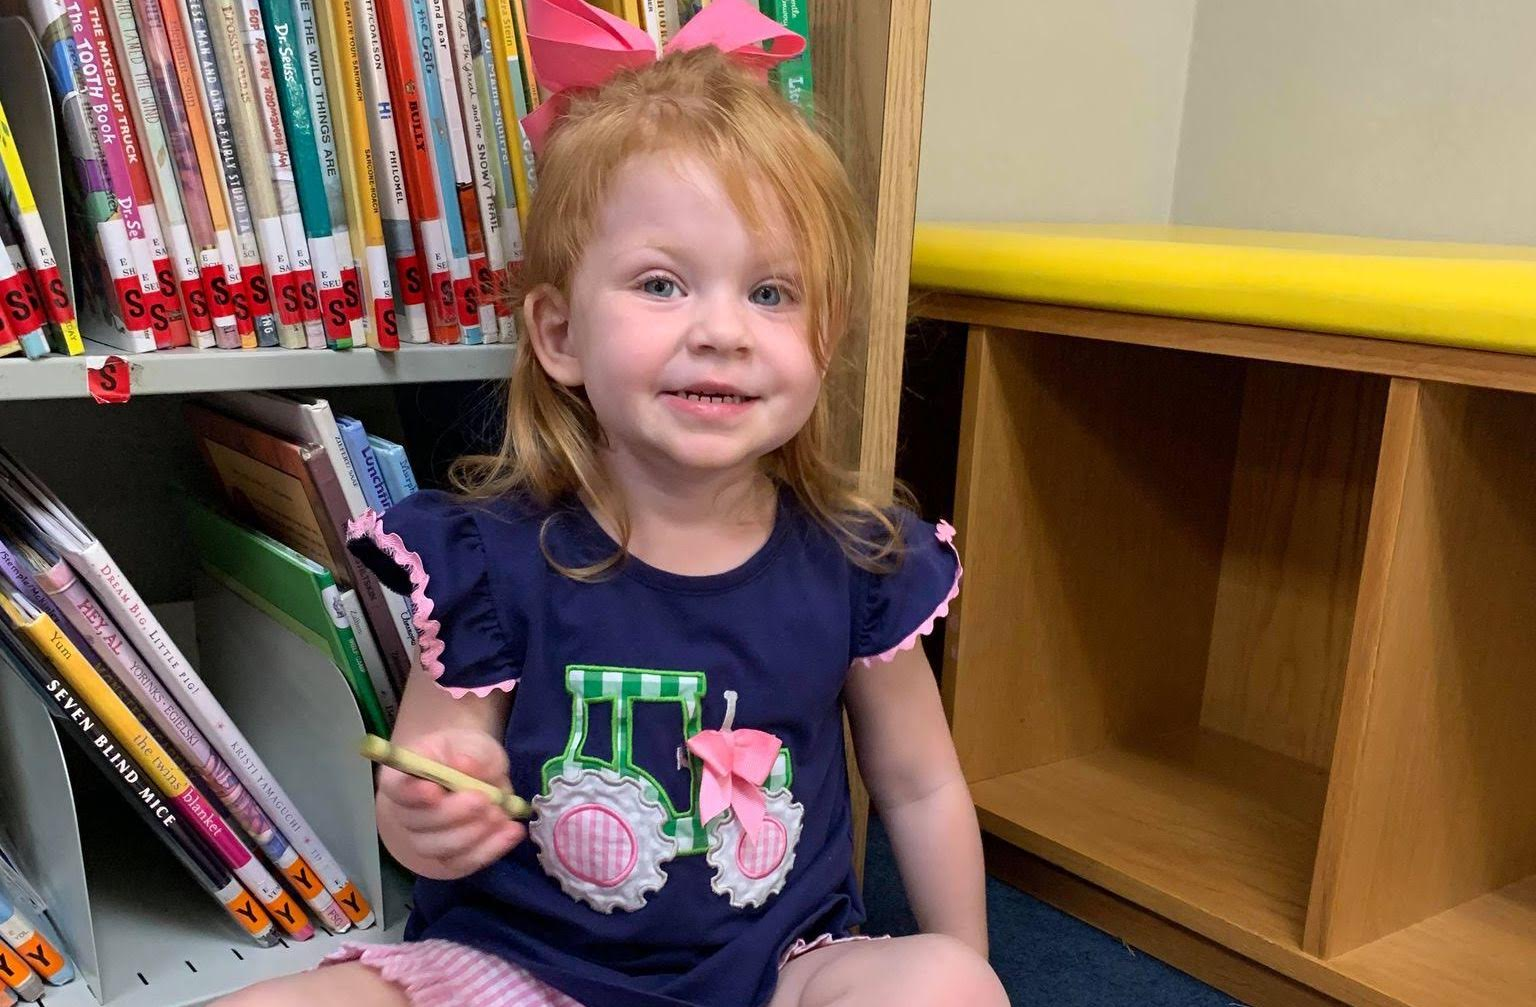 Kiersy Hicks reaches another milestone in the WBL 1,000 Book Before Kindergarten program